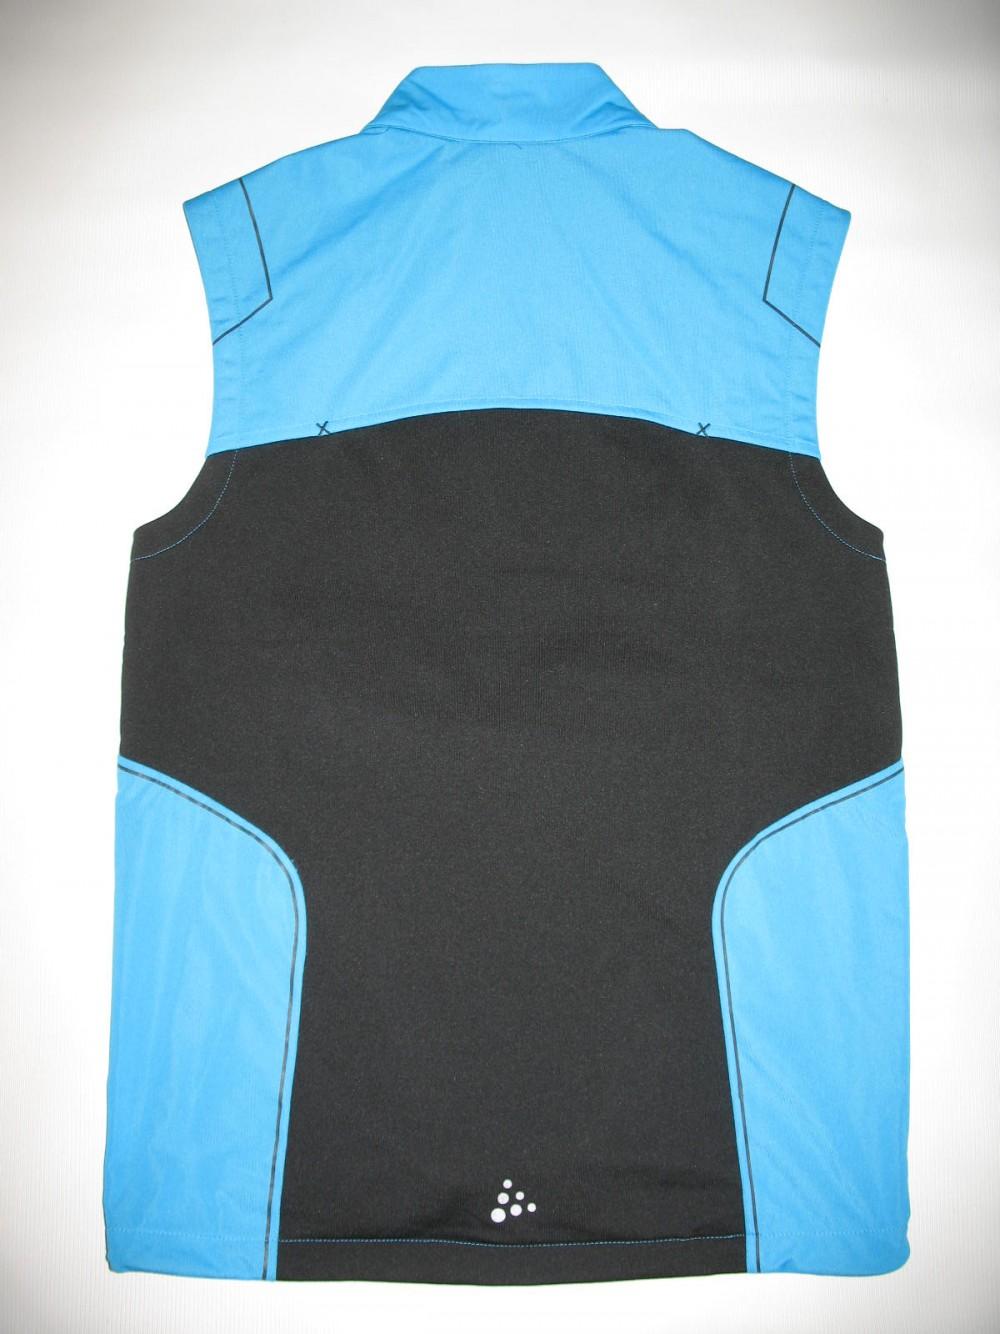 Жилет CRAFT pxc high function softshell vest (размер XS/S) - 2